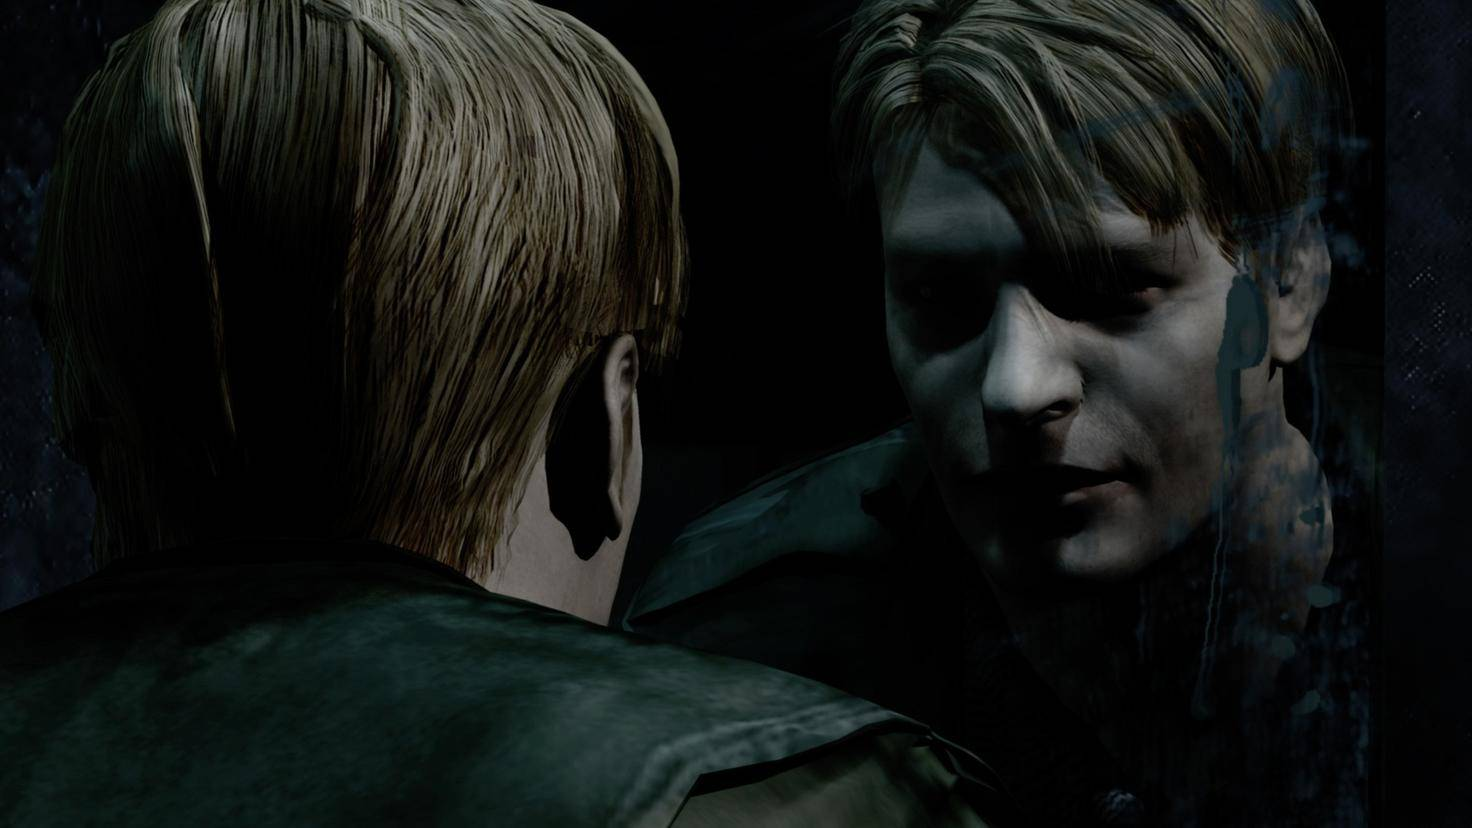 Silent-Hill-2-James-Sutherland